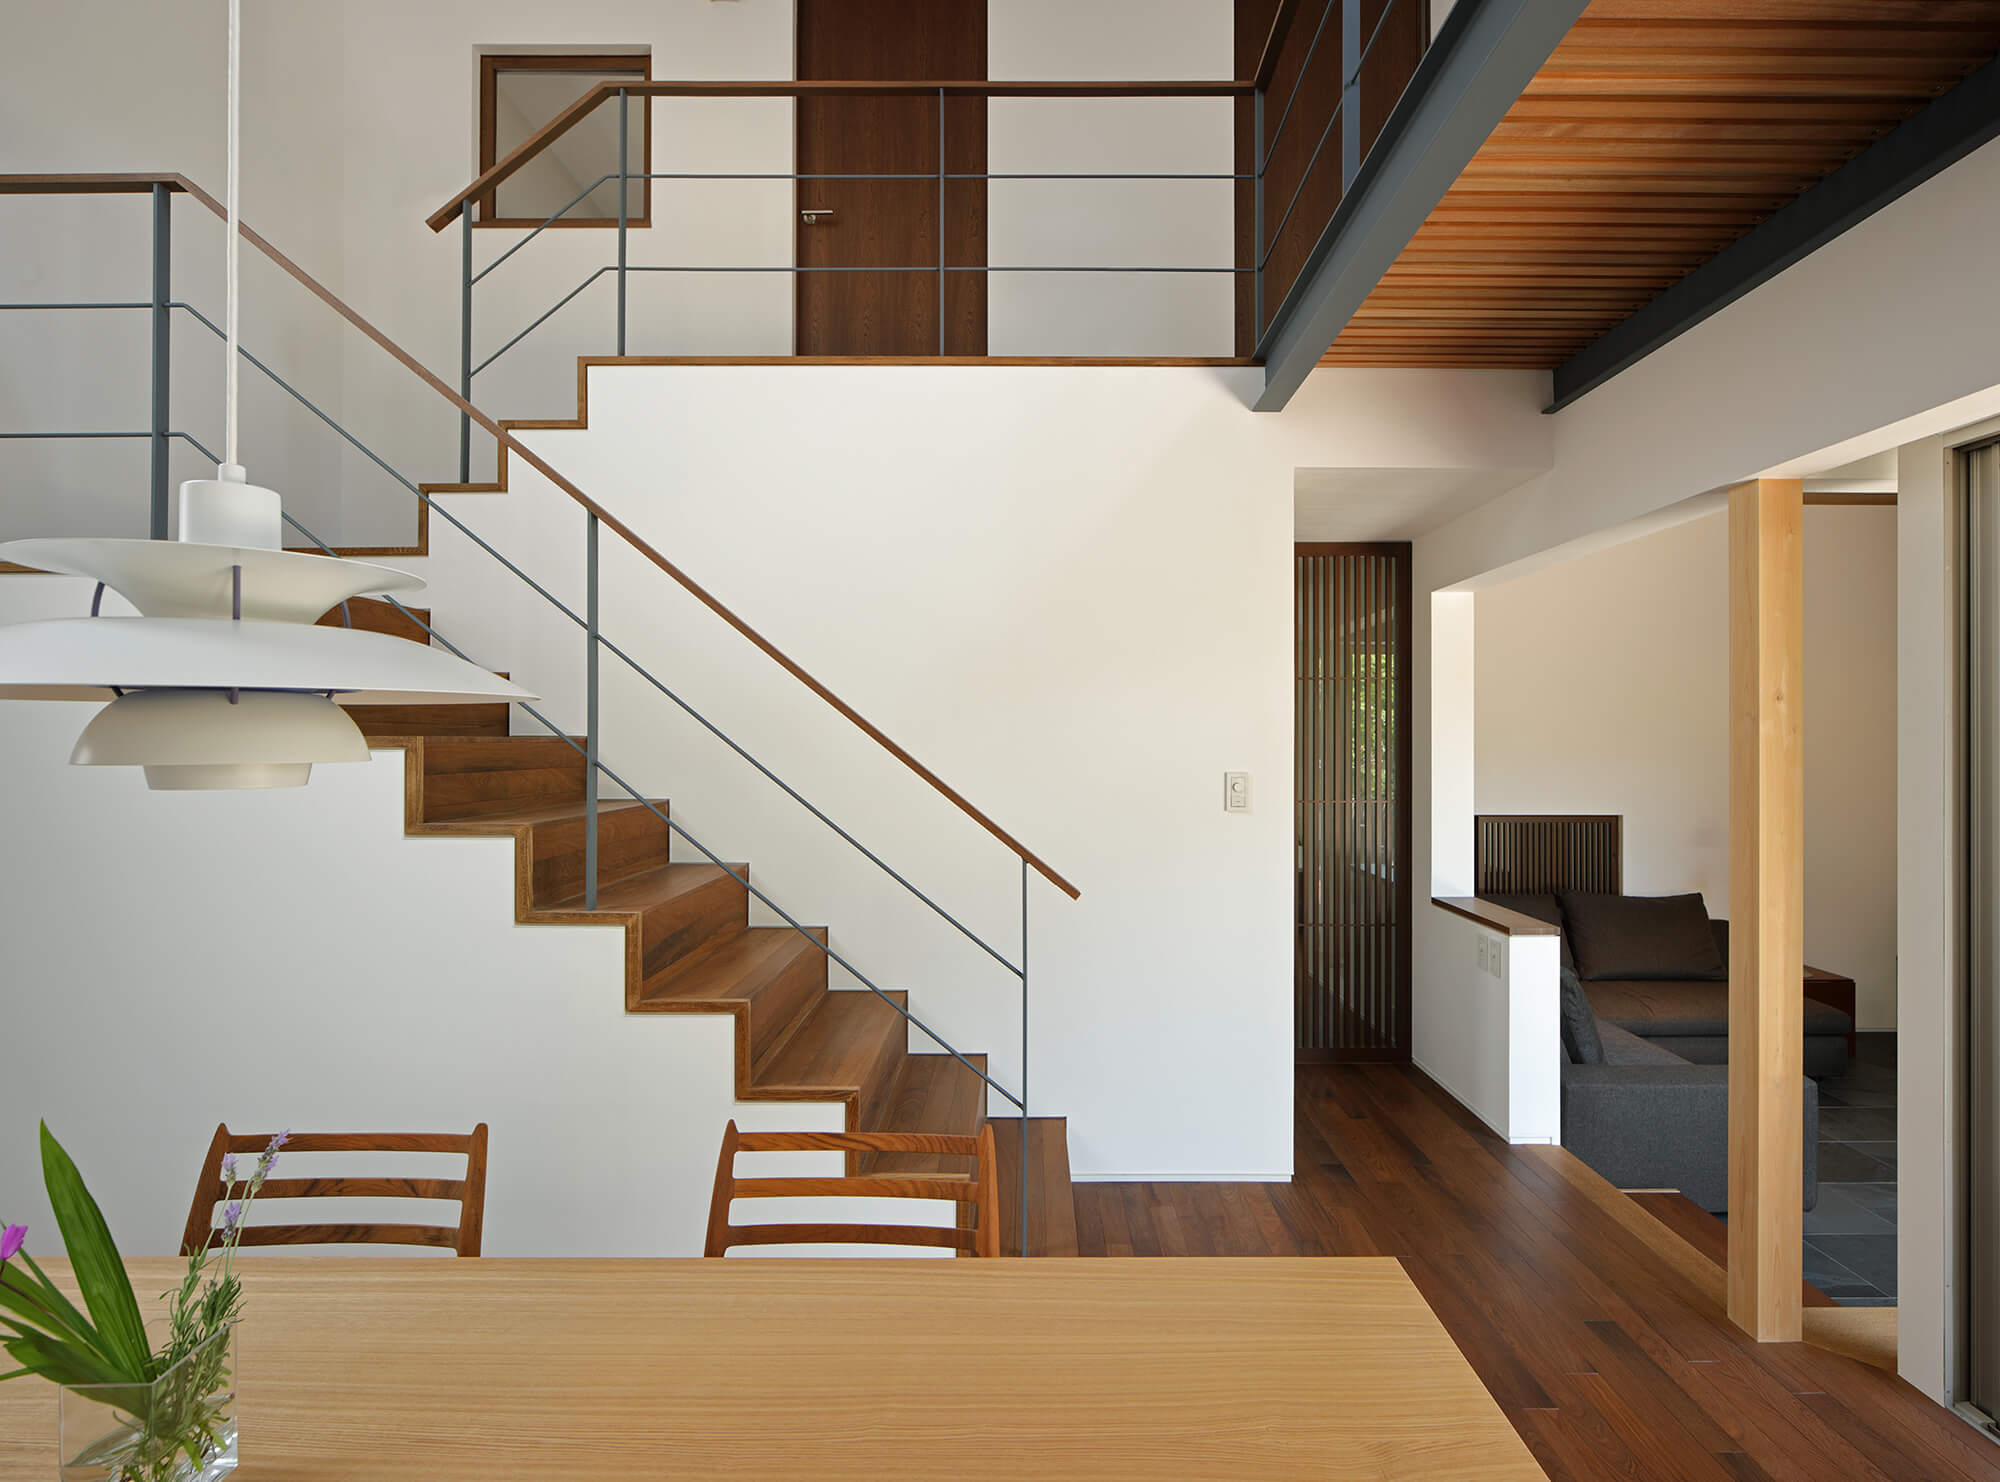 『福重の家』-福岡県福岡市-建築写真・竣工写真・インテリア写真4